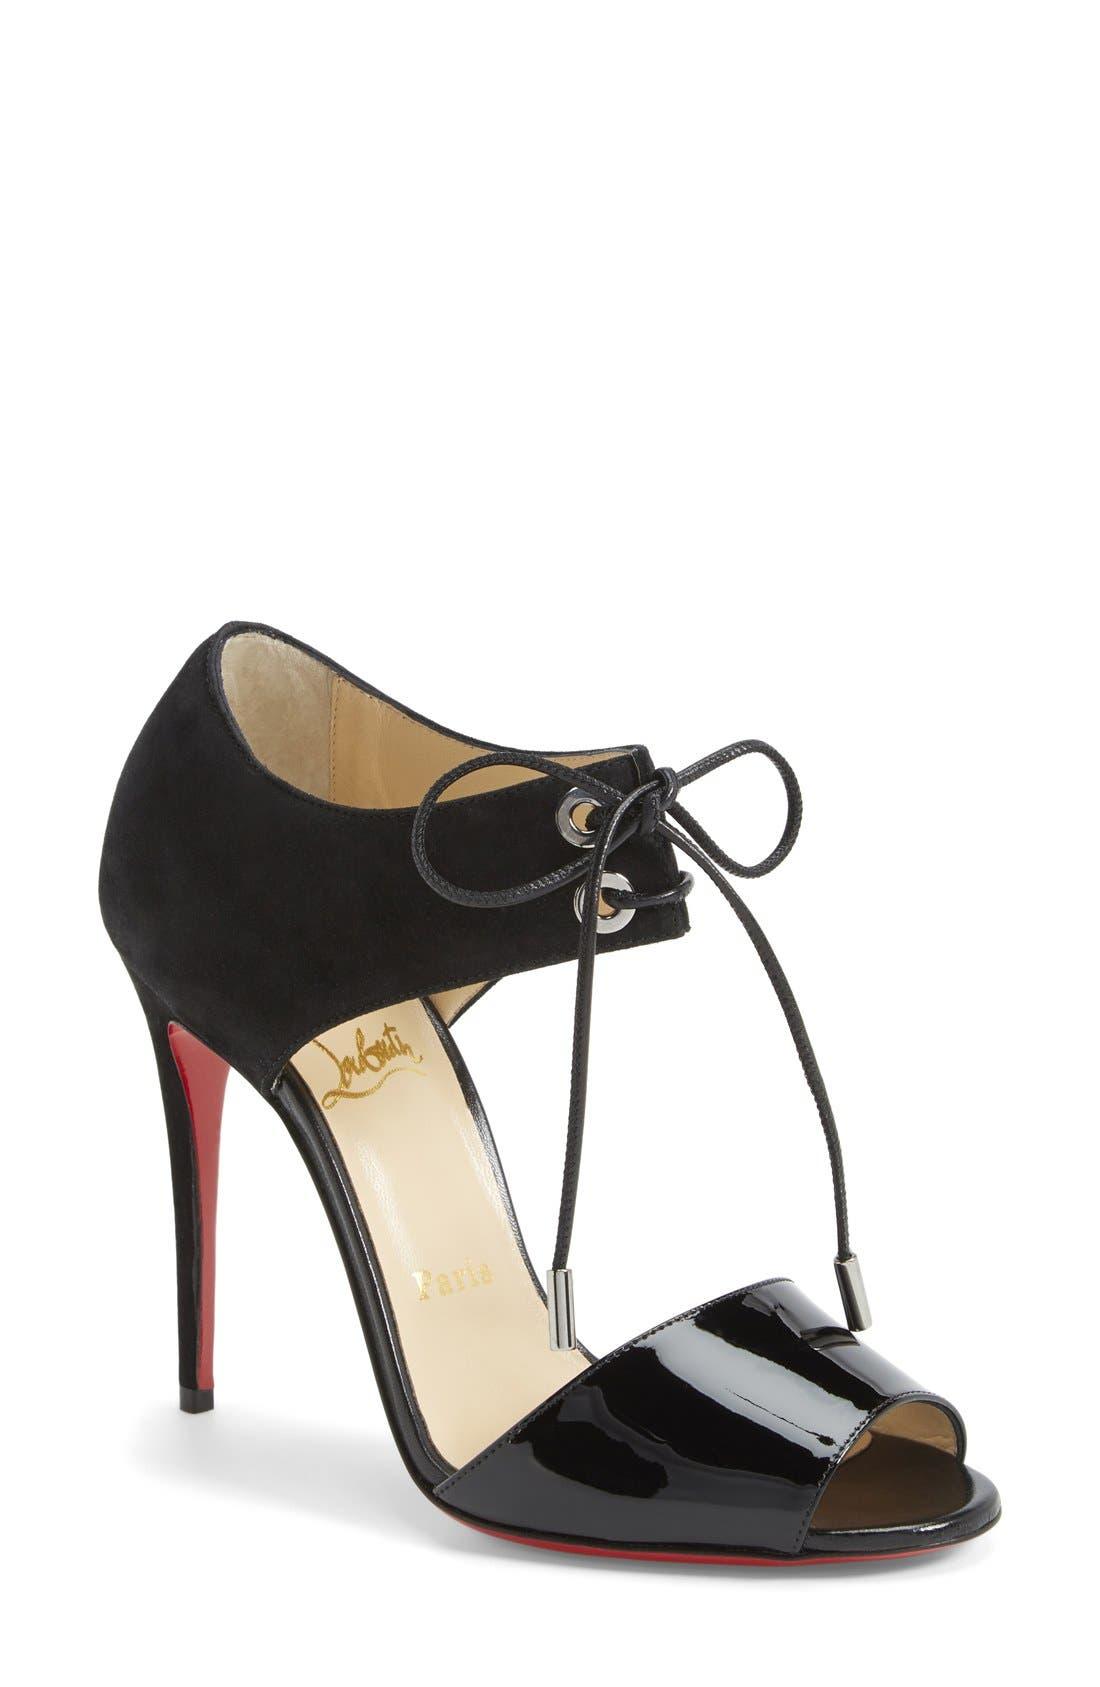 Main Image - Christian Louboutin Tie-Up Leather Sandal